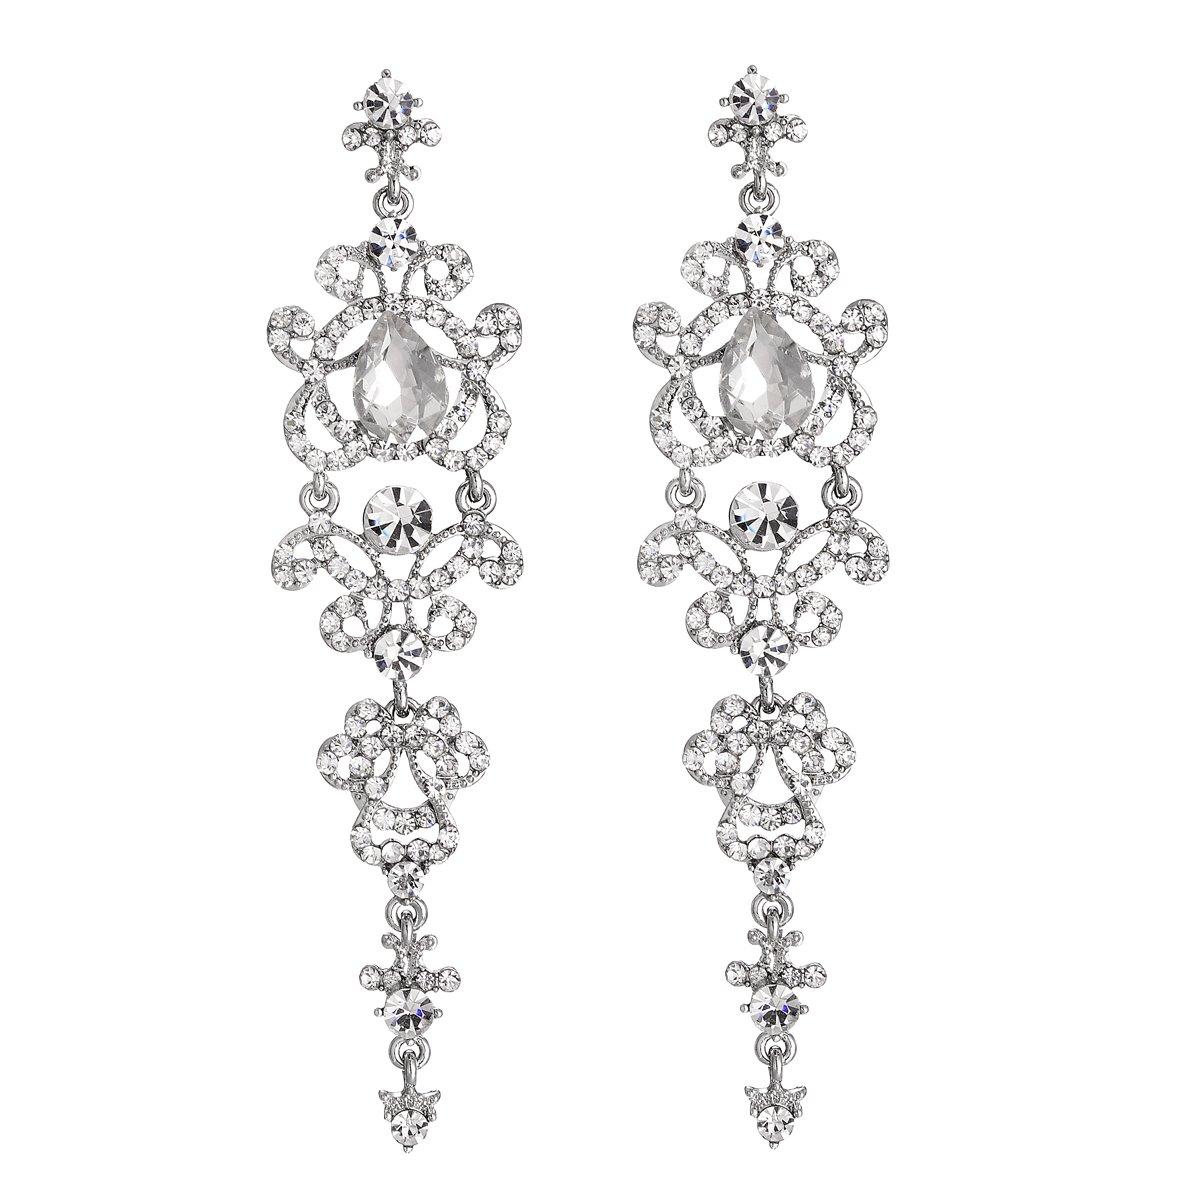 Bracelets Smart Women Bracelet Zircon Crystal Bracelet Bangle Womens Wedding Bridal Jewellery Gw Fashion Jewelry